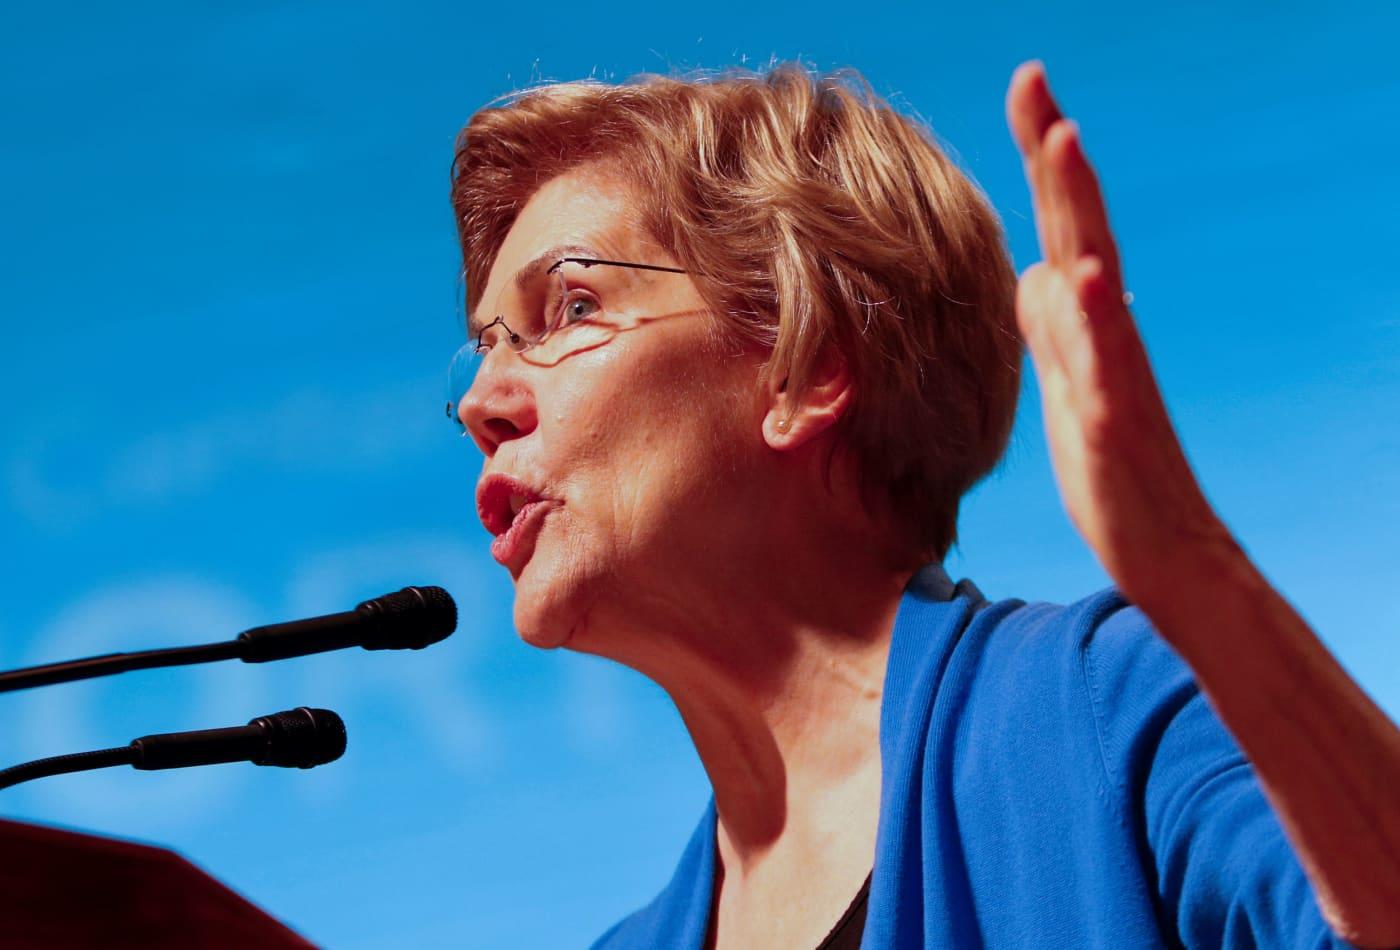 Sen. Elizabeth Warren demands 'corruption' probe after report of Amazon options purchase by Postal Service chief Louis DeJoy